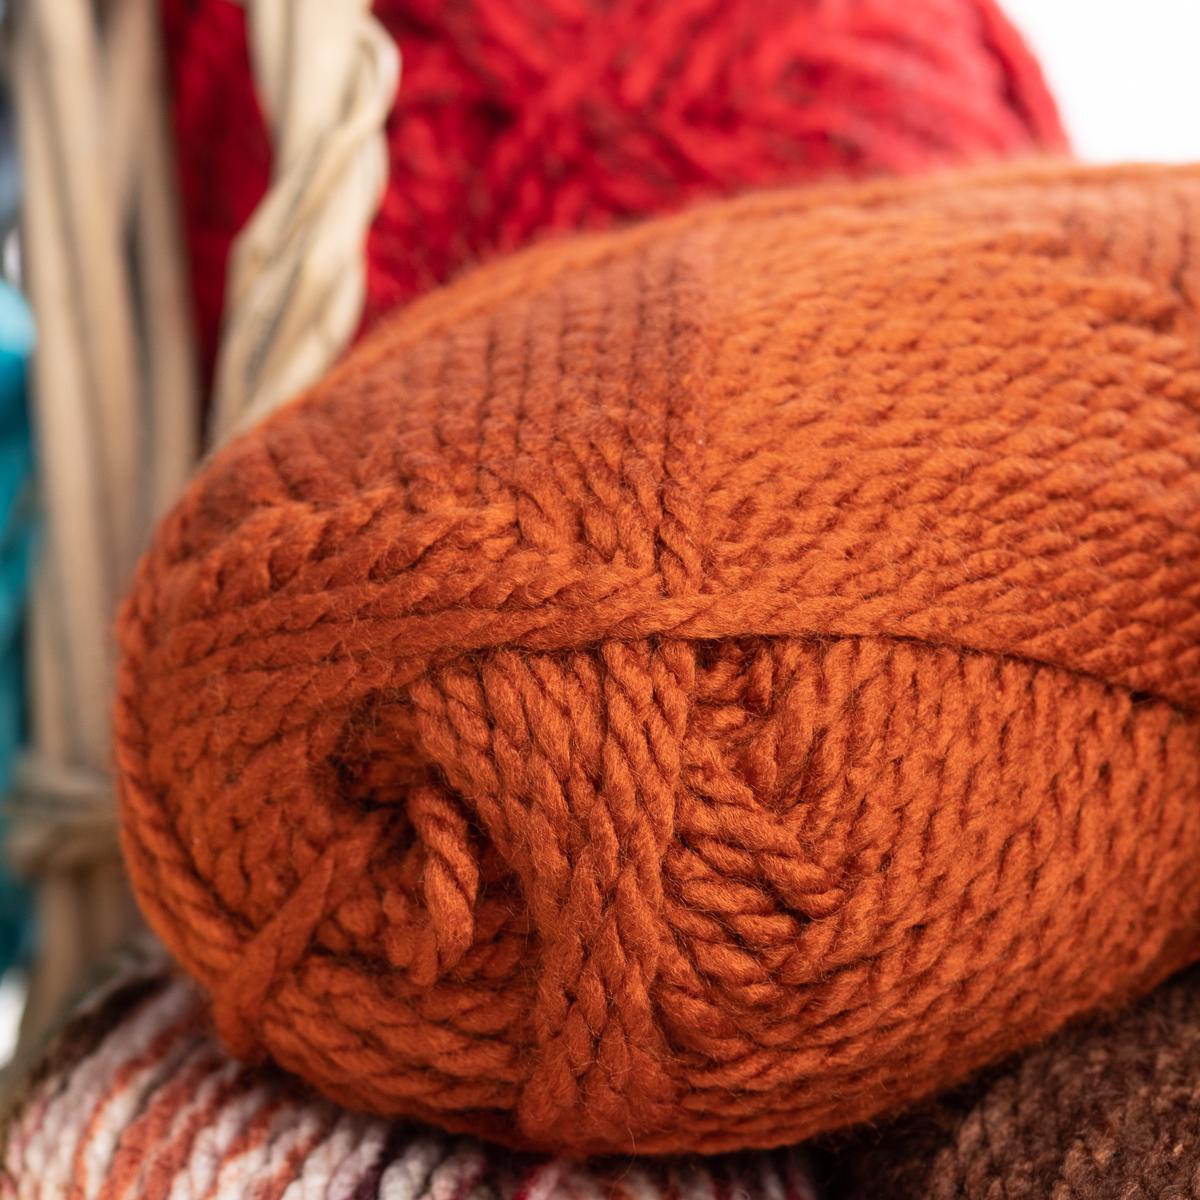 3pk-Premier-Yarns-Deborah-Norville-Serenity-100-Acrylic-Yarn-Chunky-5-Knitting thumbnail 84